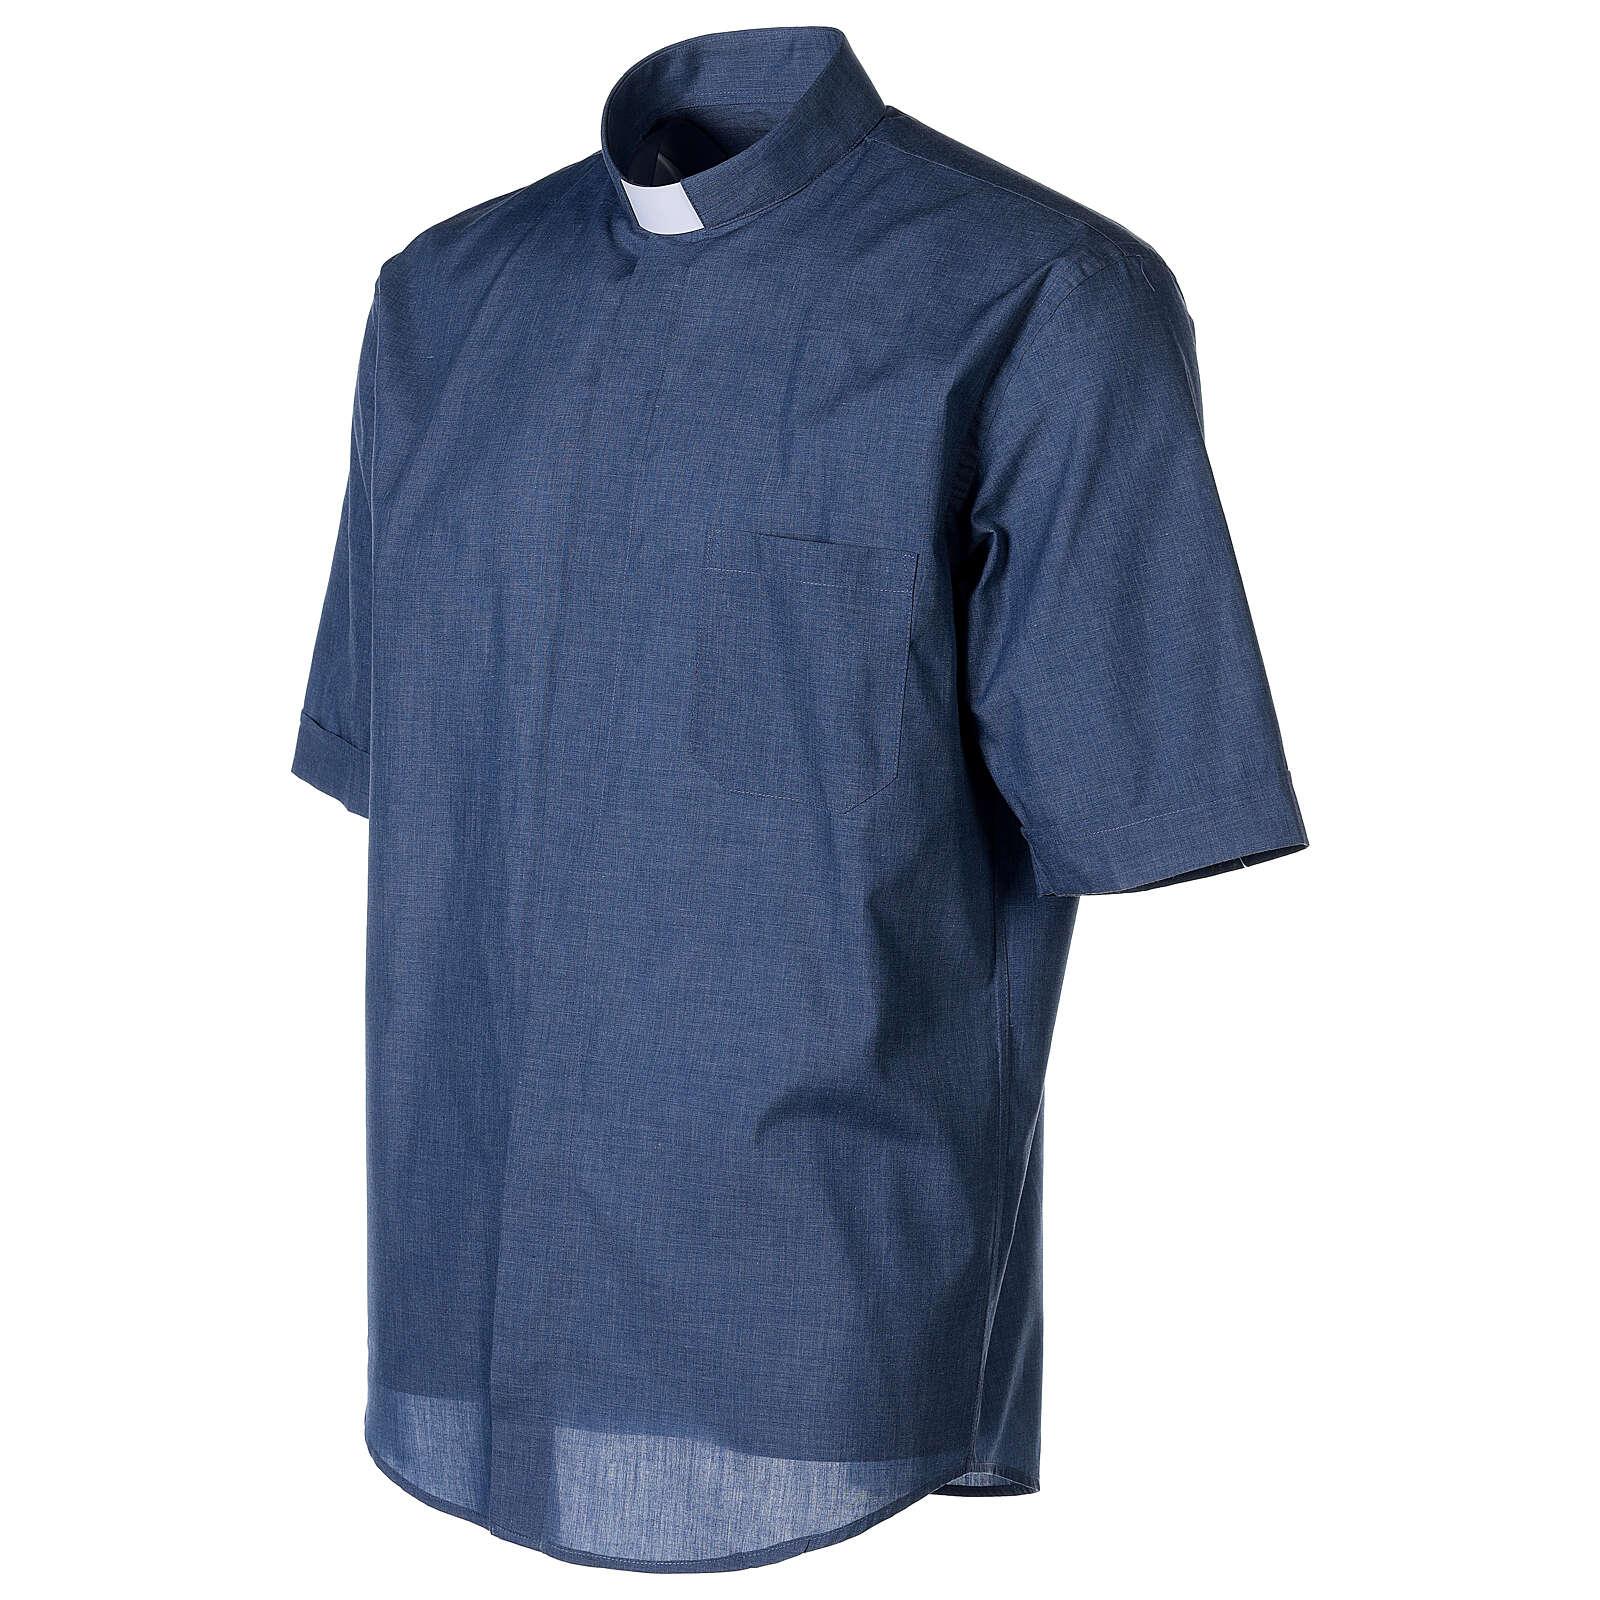 Camisa cuello clergy media manga de jean 4